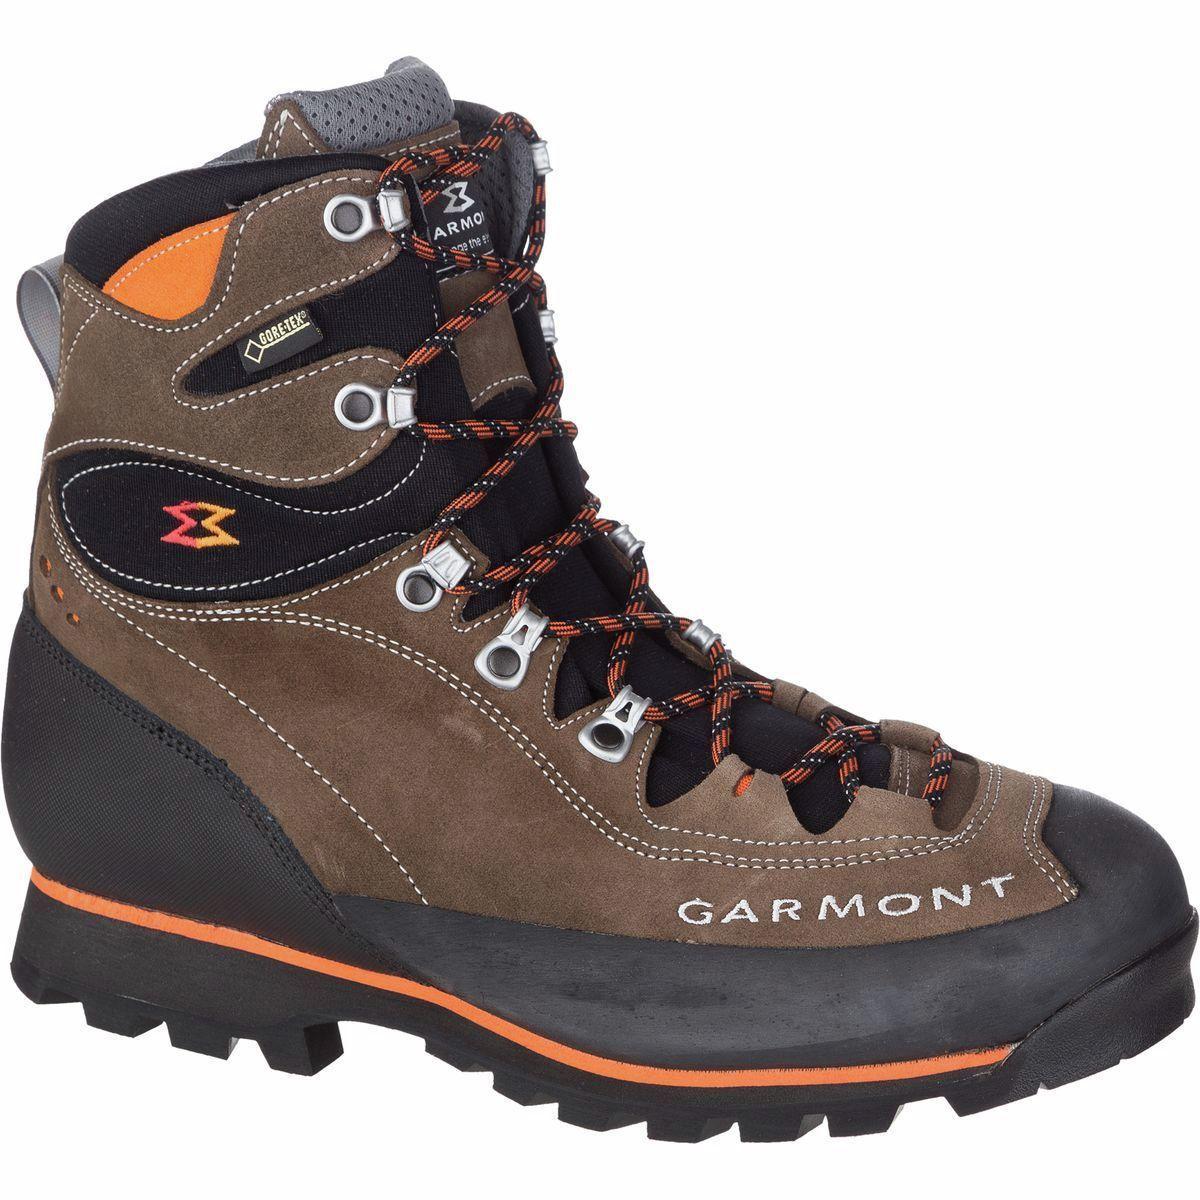 1026e1d680b Men's Tower Trek Gtx Backpacking Boot